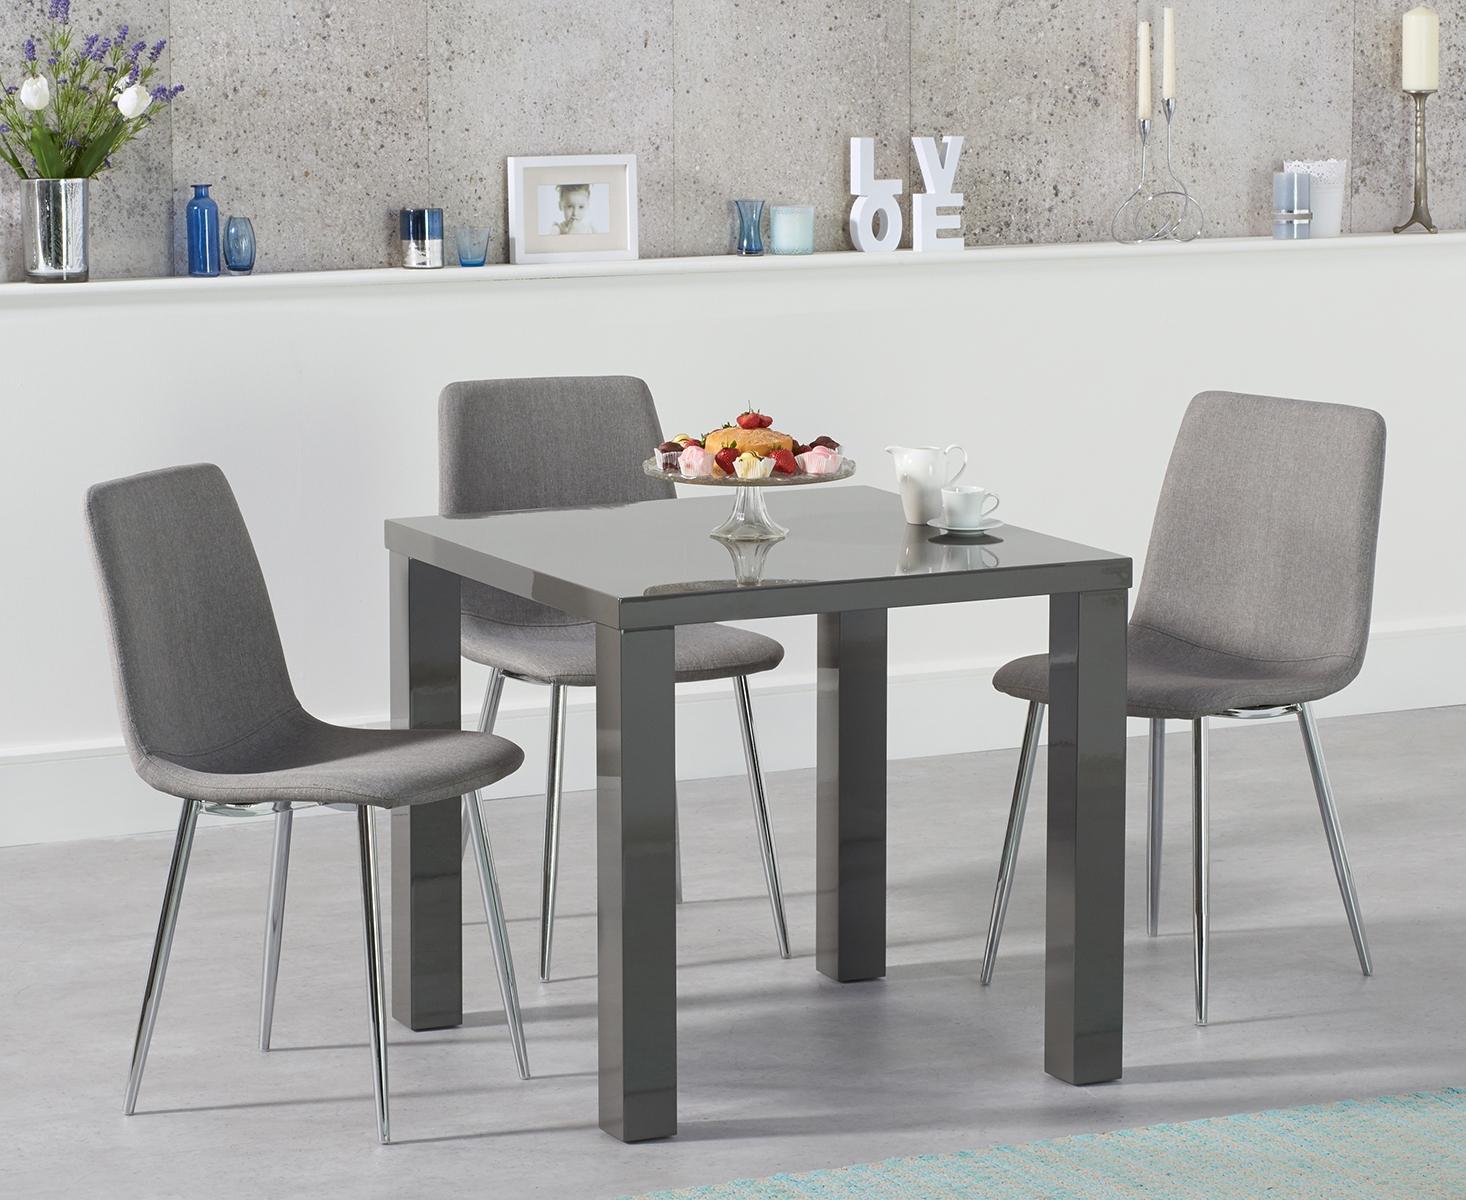 Photo of Atlanta 80cm dark grey high gloss dining table with hamburg fabric and chrome leg chairs